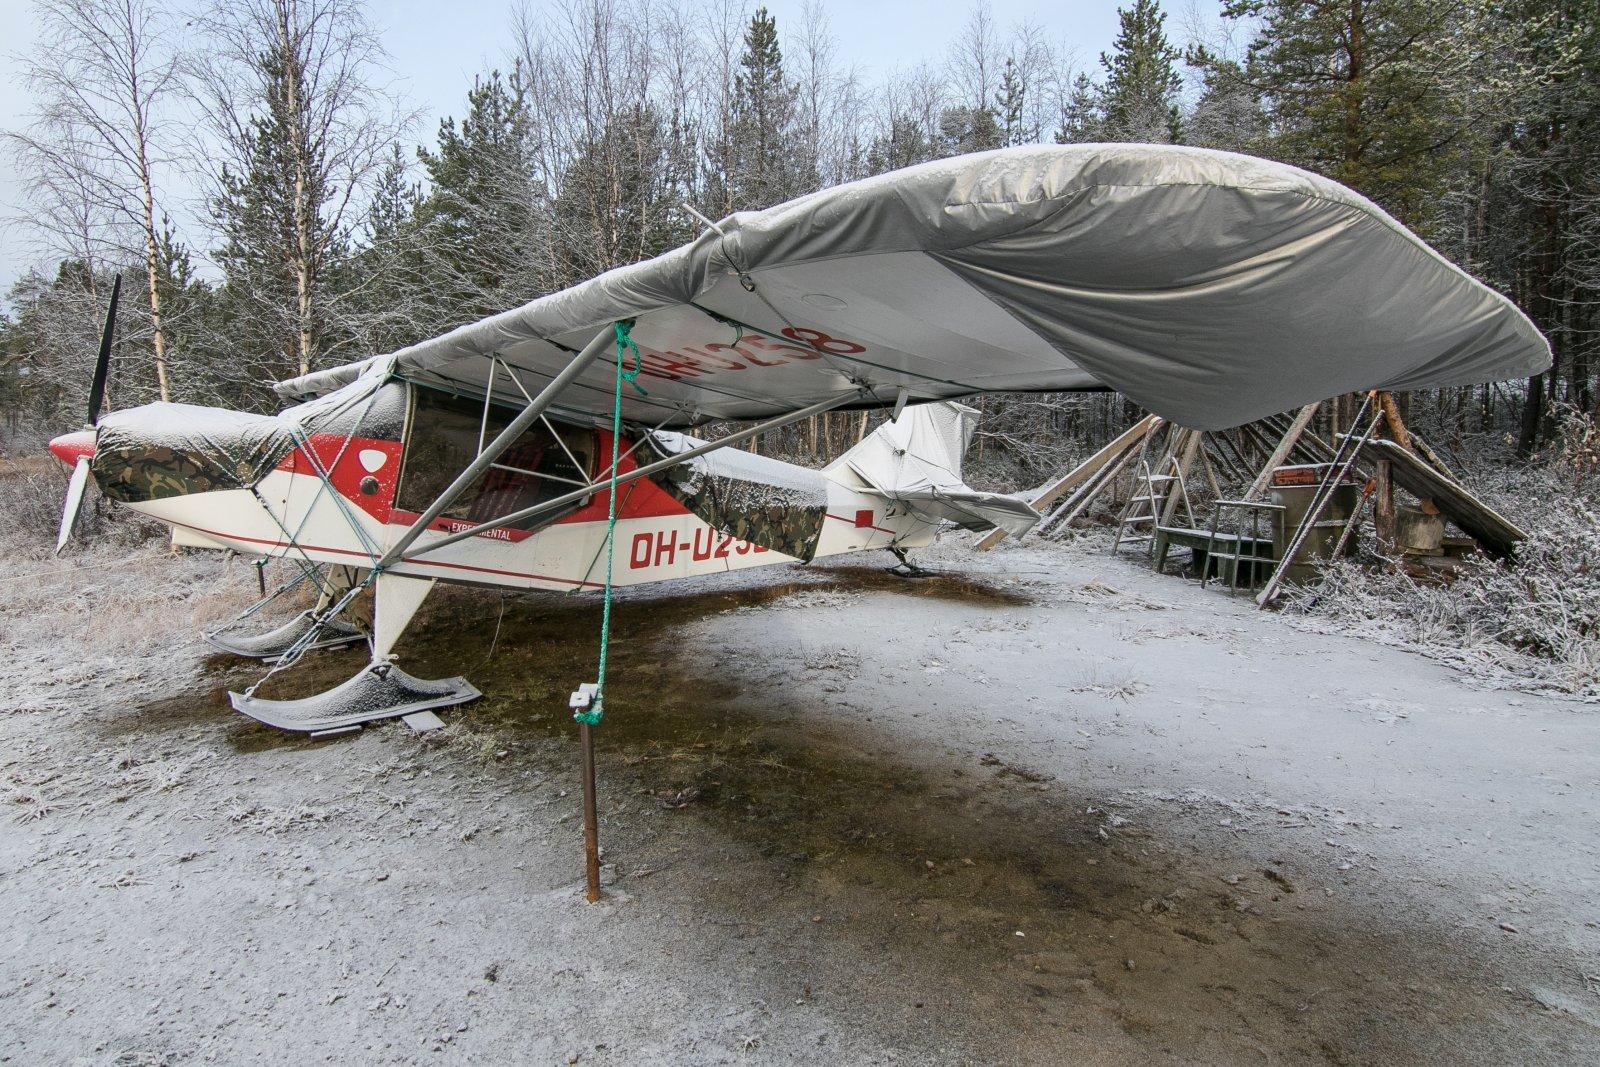 OH-U258. Alajärven rannassa. 17.10.2020.